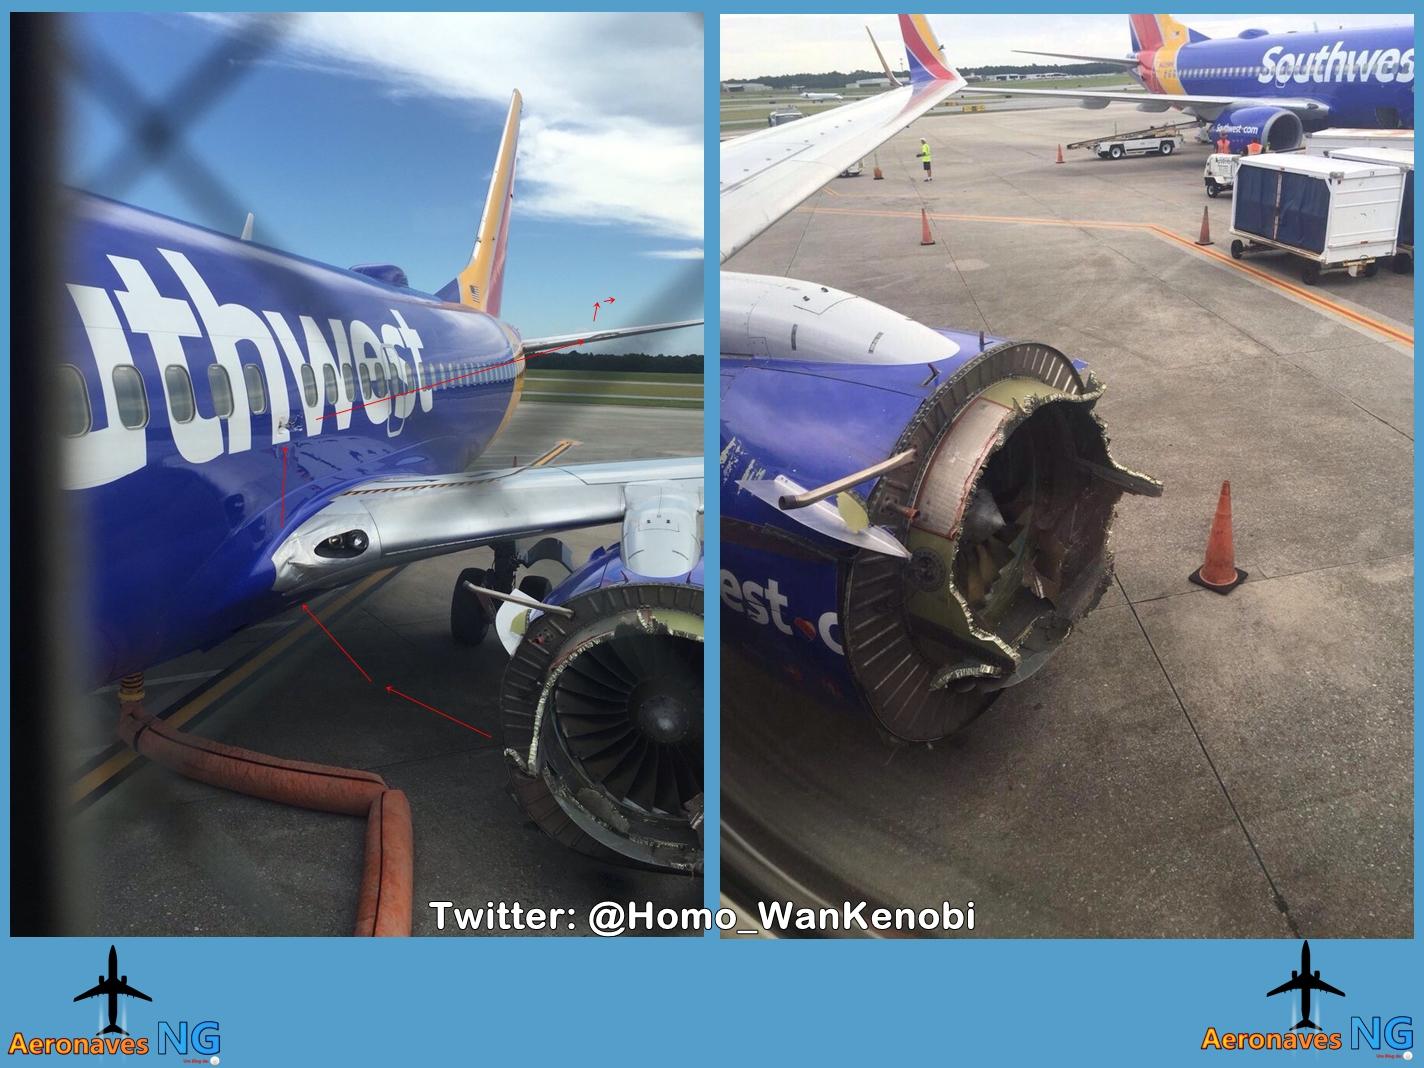 AF66 Paris Los Angeles a380 perte de la soufflante en vol Boeing%2B737-7H4%2B-%2BN766SW%2B-%2B27-8-2016%2B%25282%2529